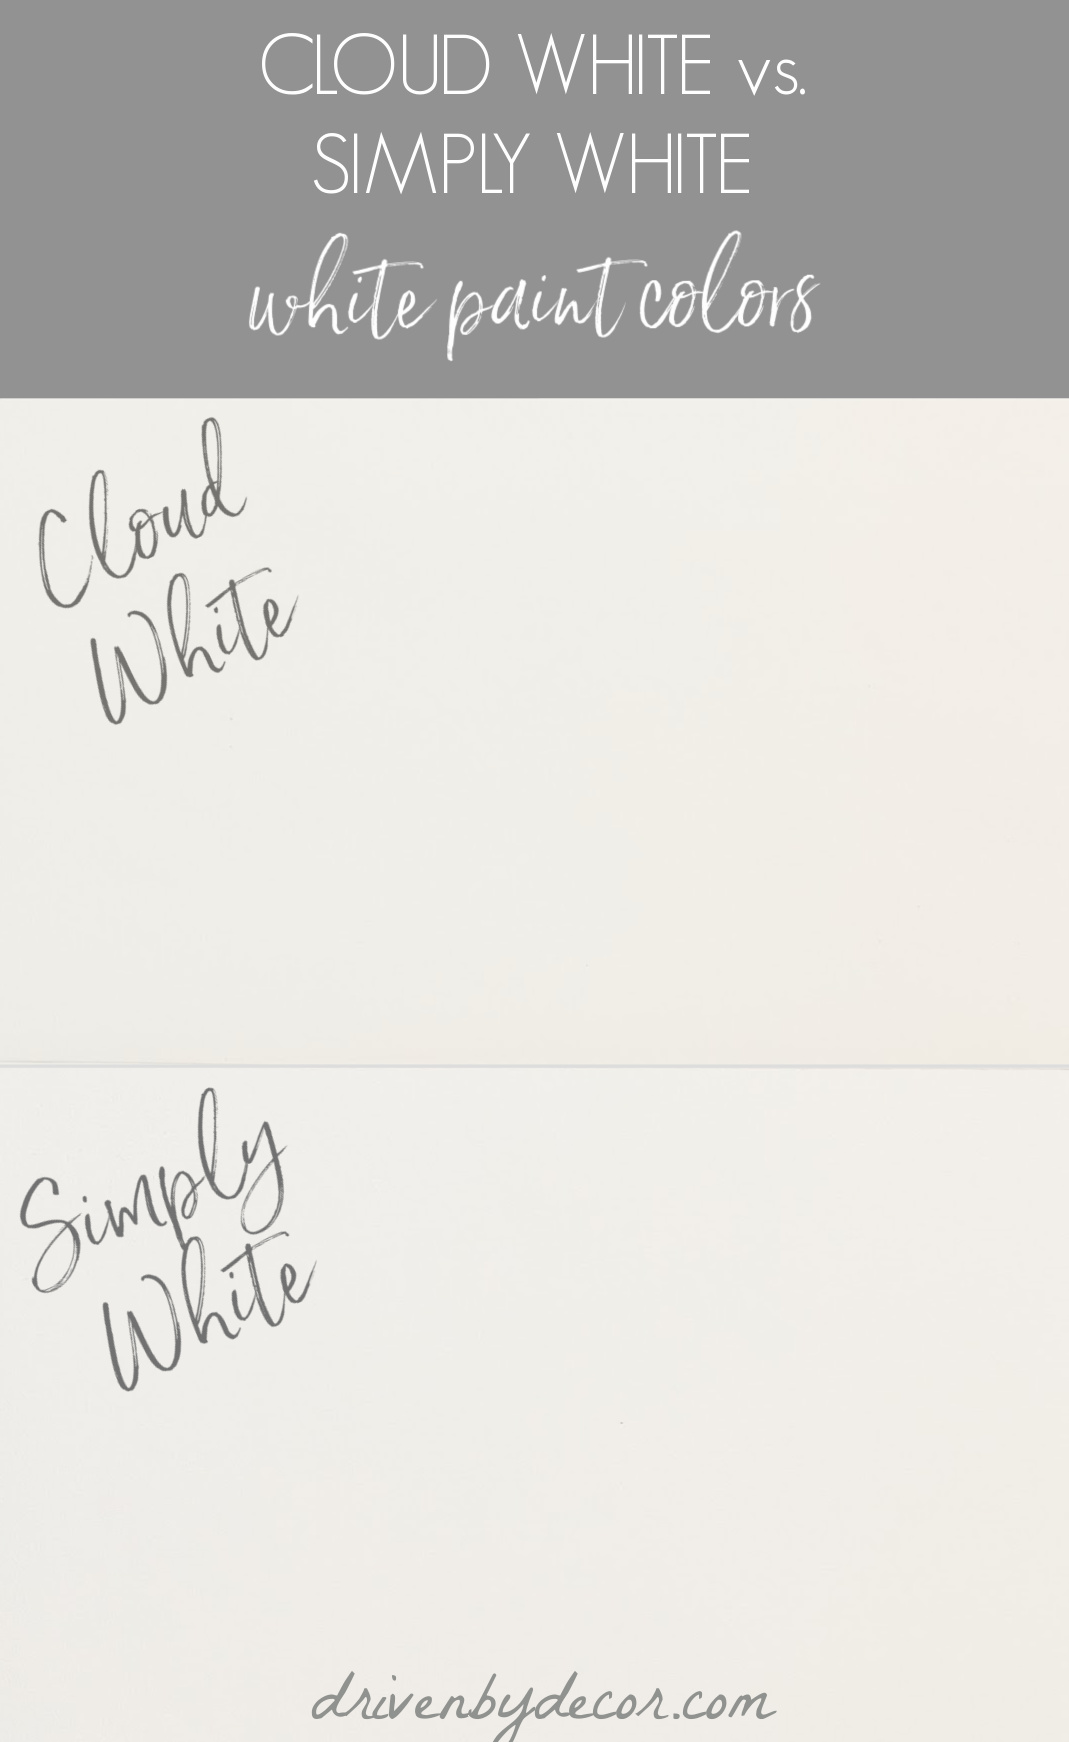 Benjamin Moore Cloud White vs. Simply White paint colors